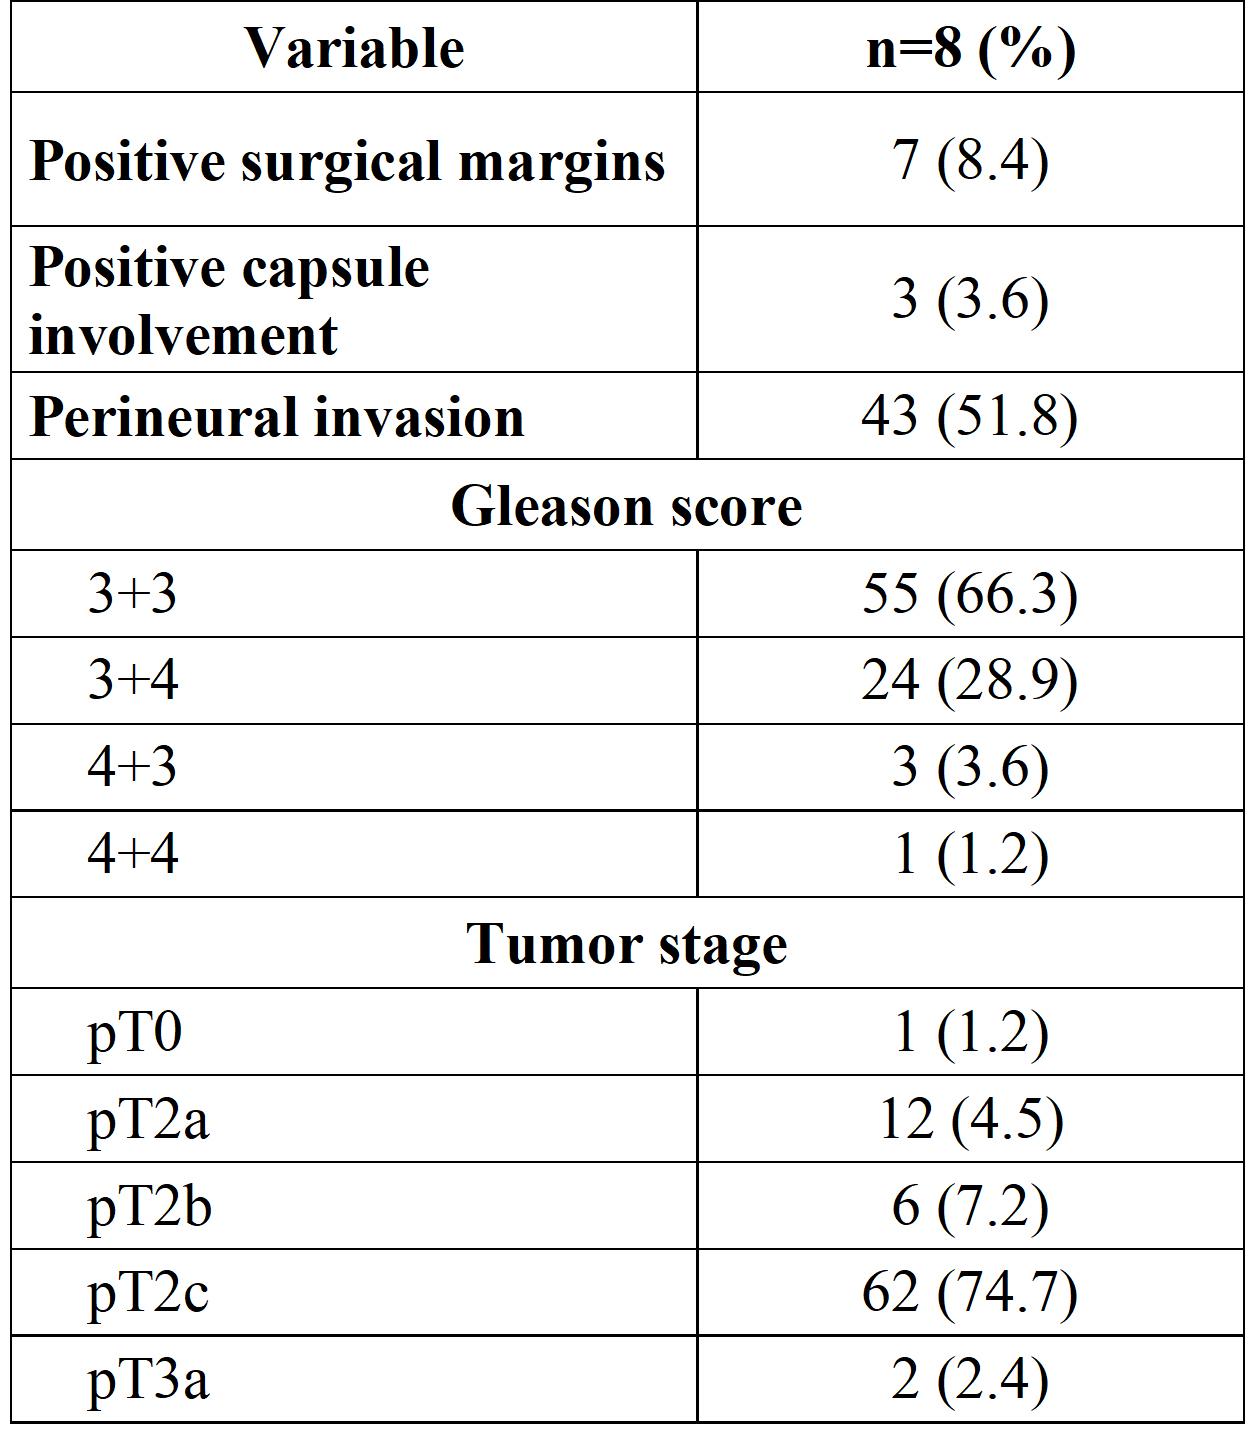 gleason 54 prostate cancer